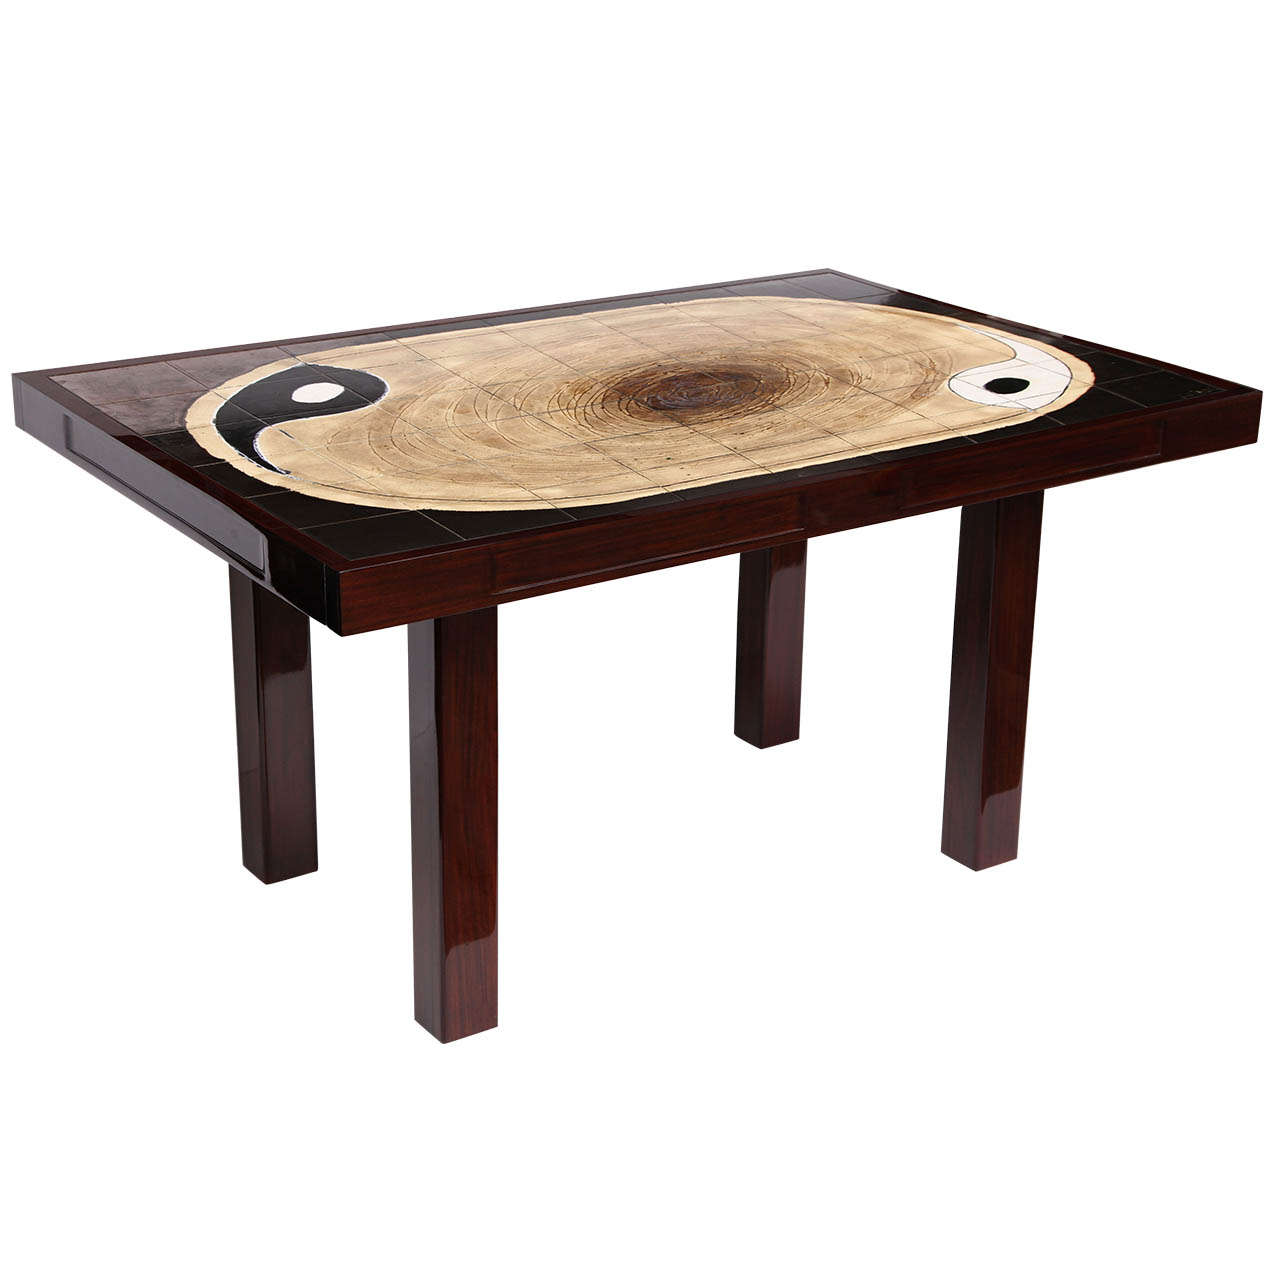 Yin Yang Ceramic Tile Top Table For Sale